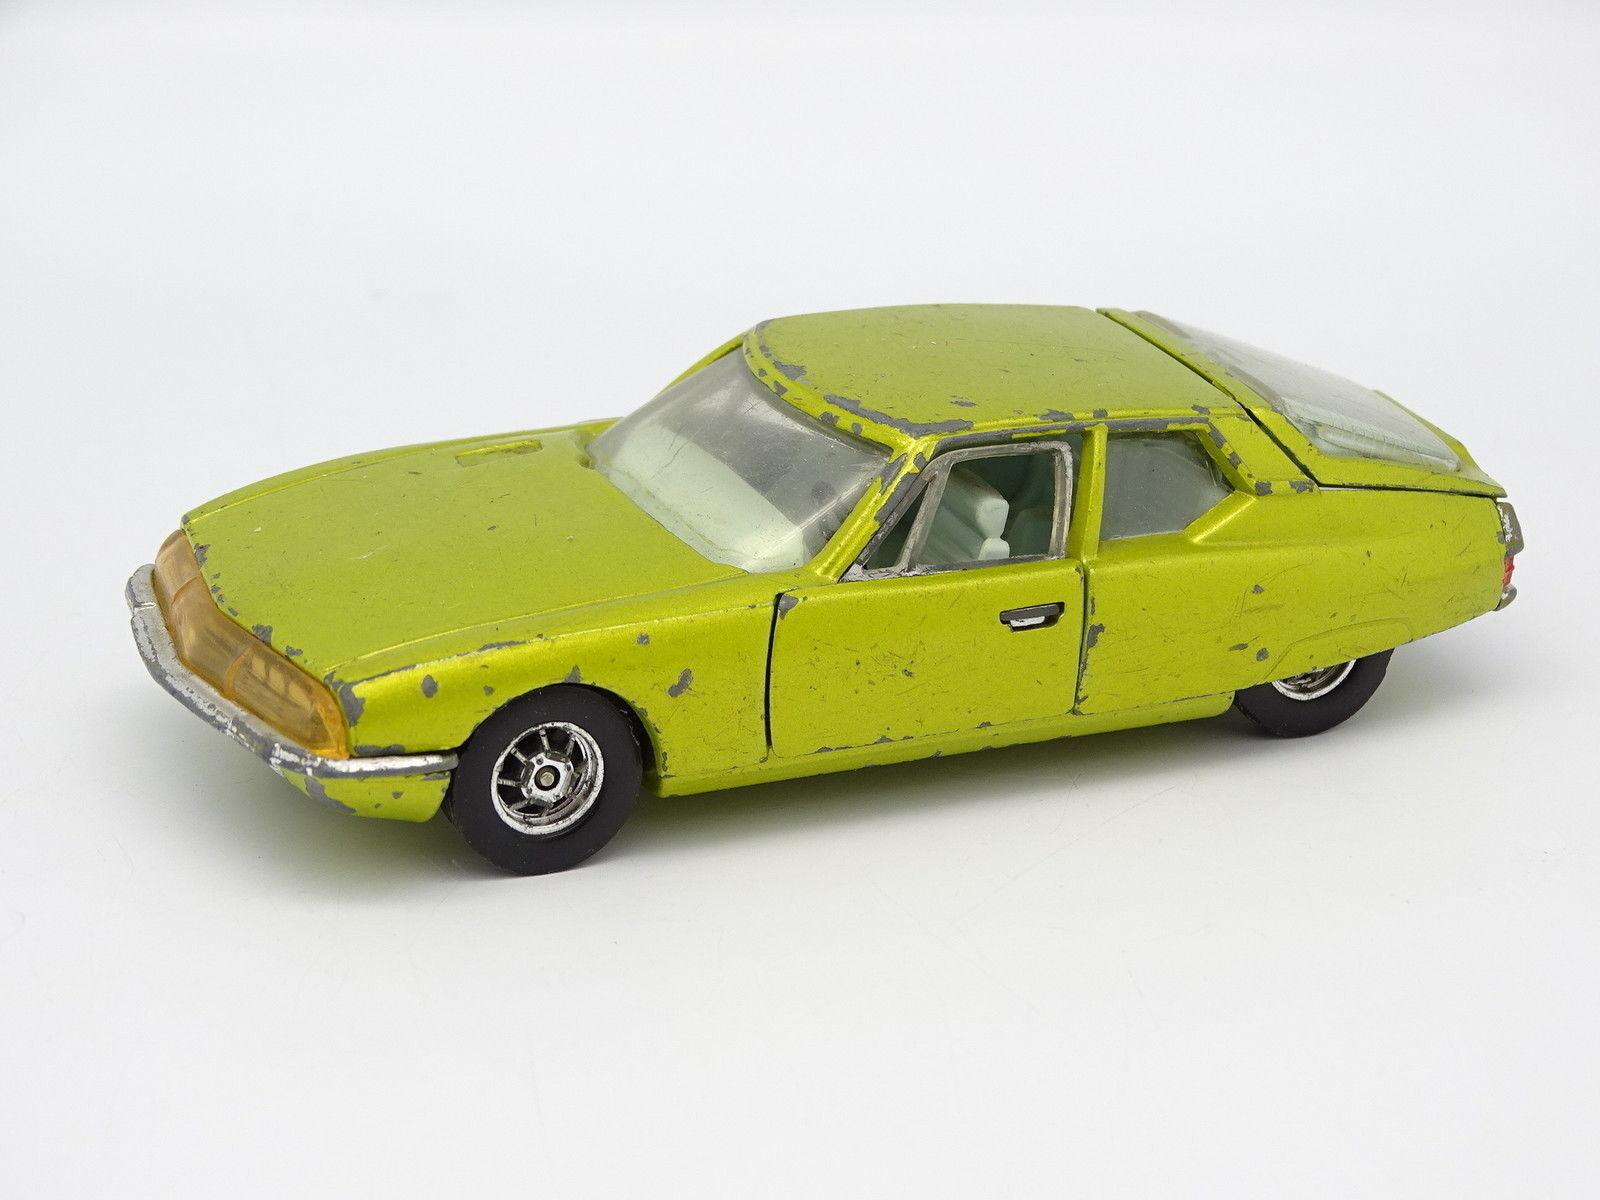 Corgi Toys SB 1 43 - Citroen SM Yellow